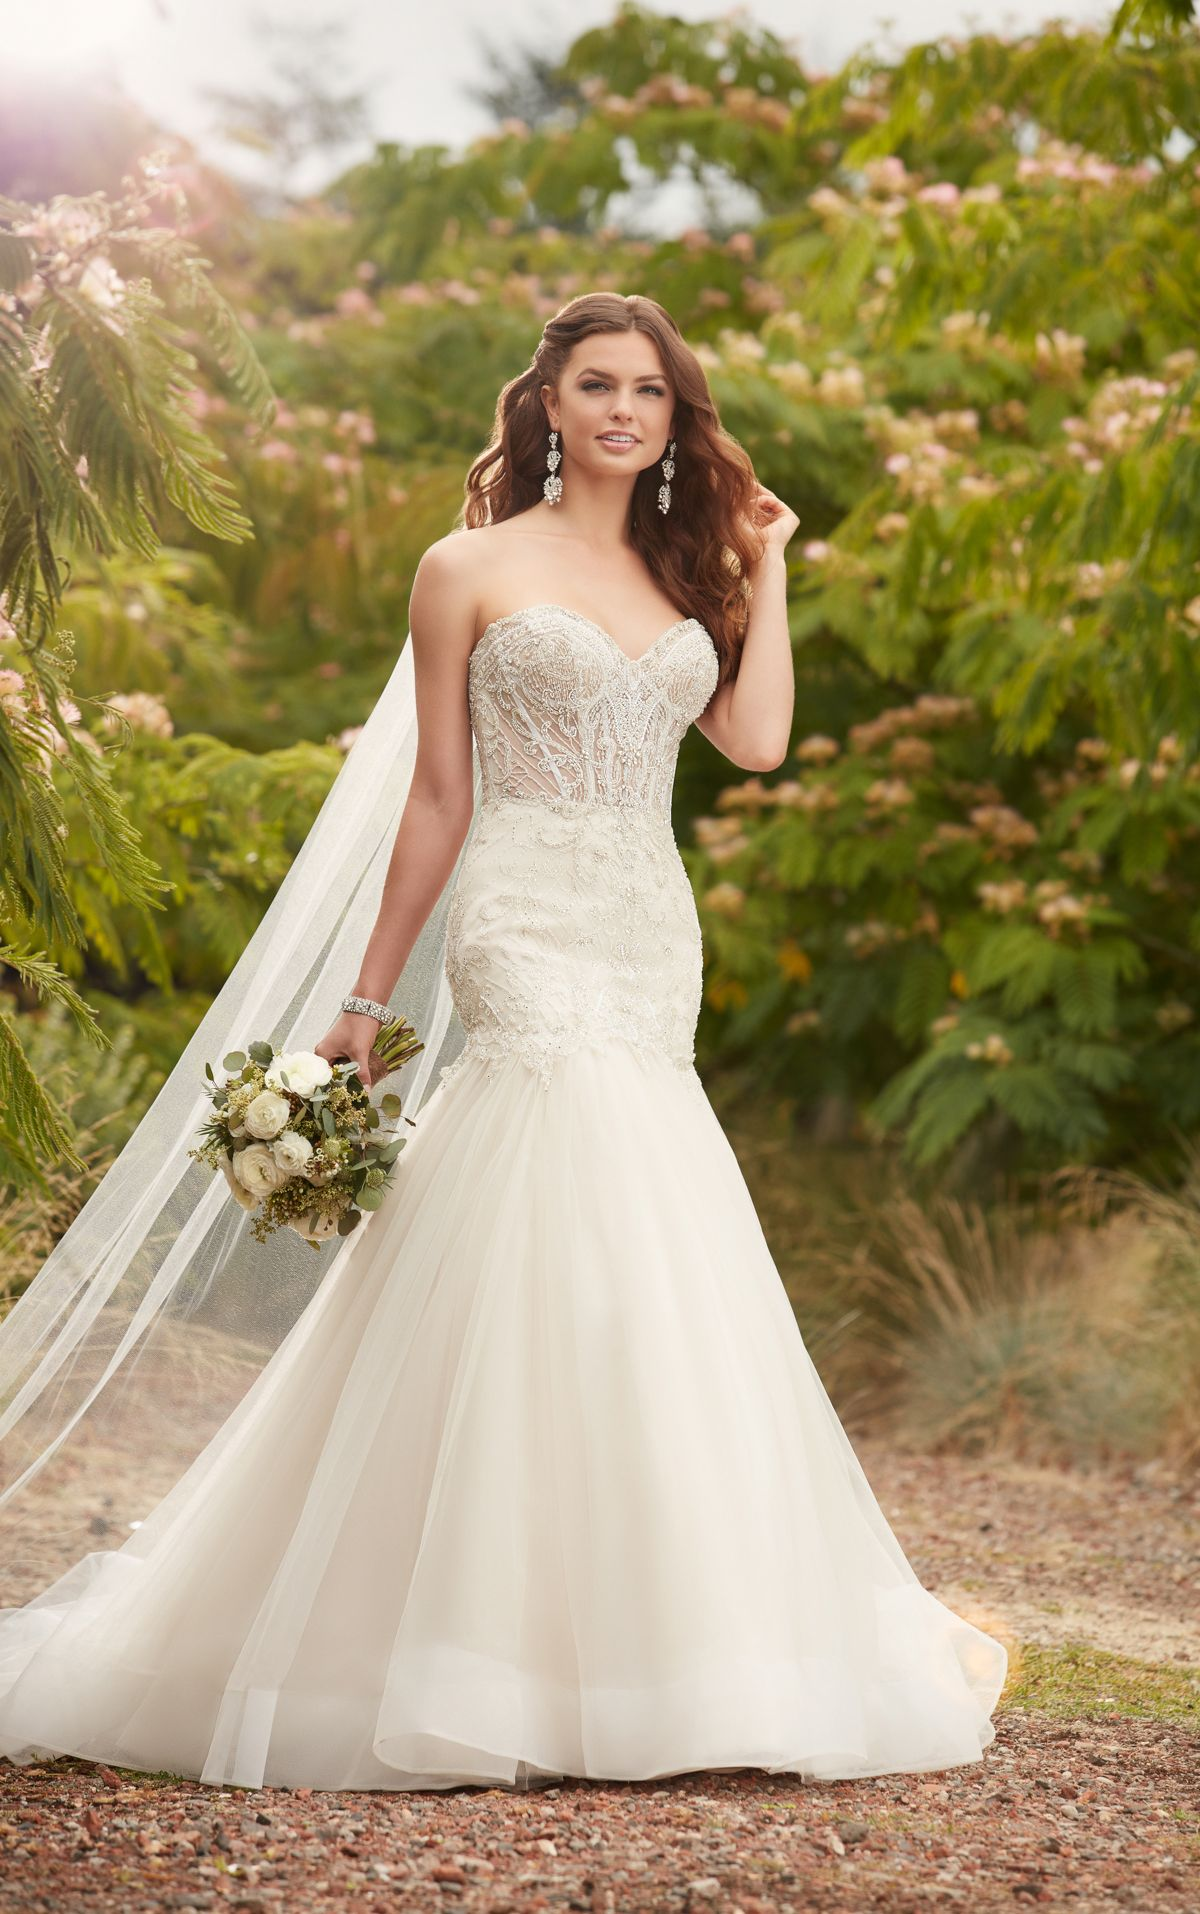 Plus Size Wedding Dresses Washington Dc : Art deco beaded wedding dress dresses